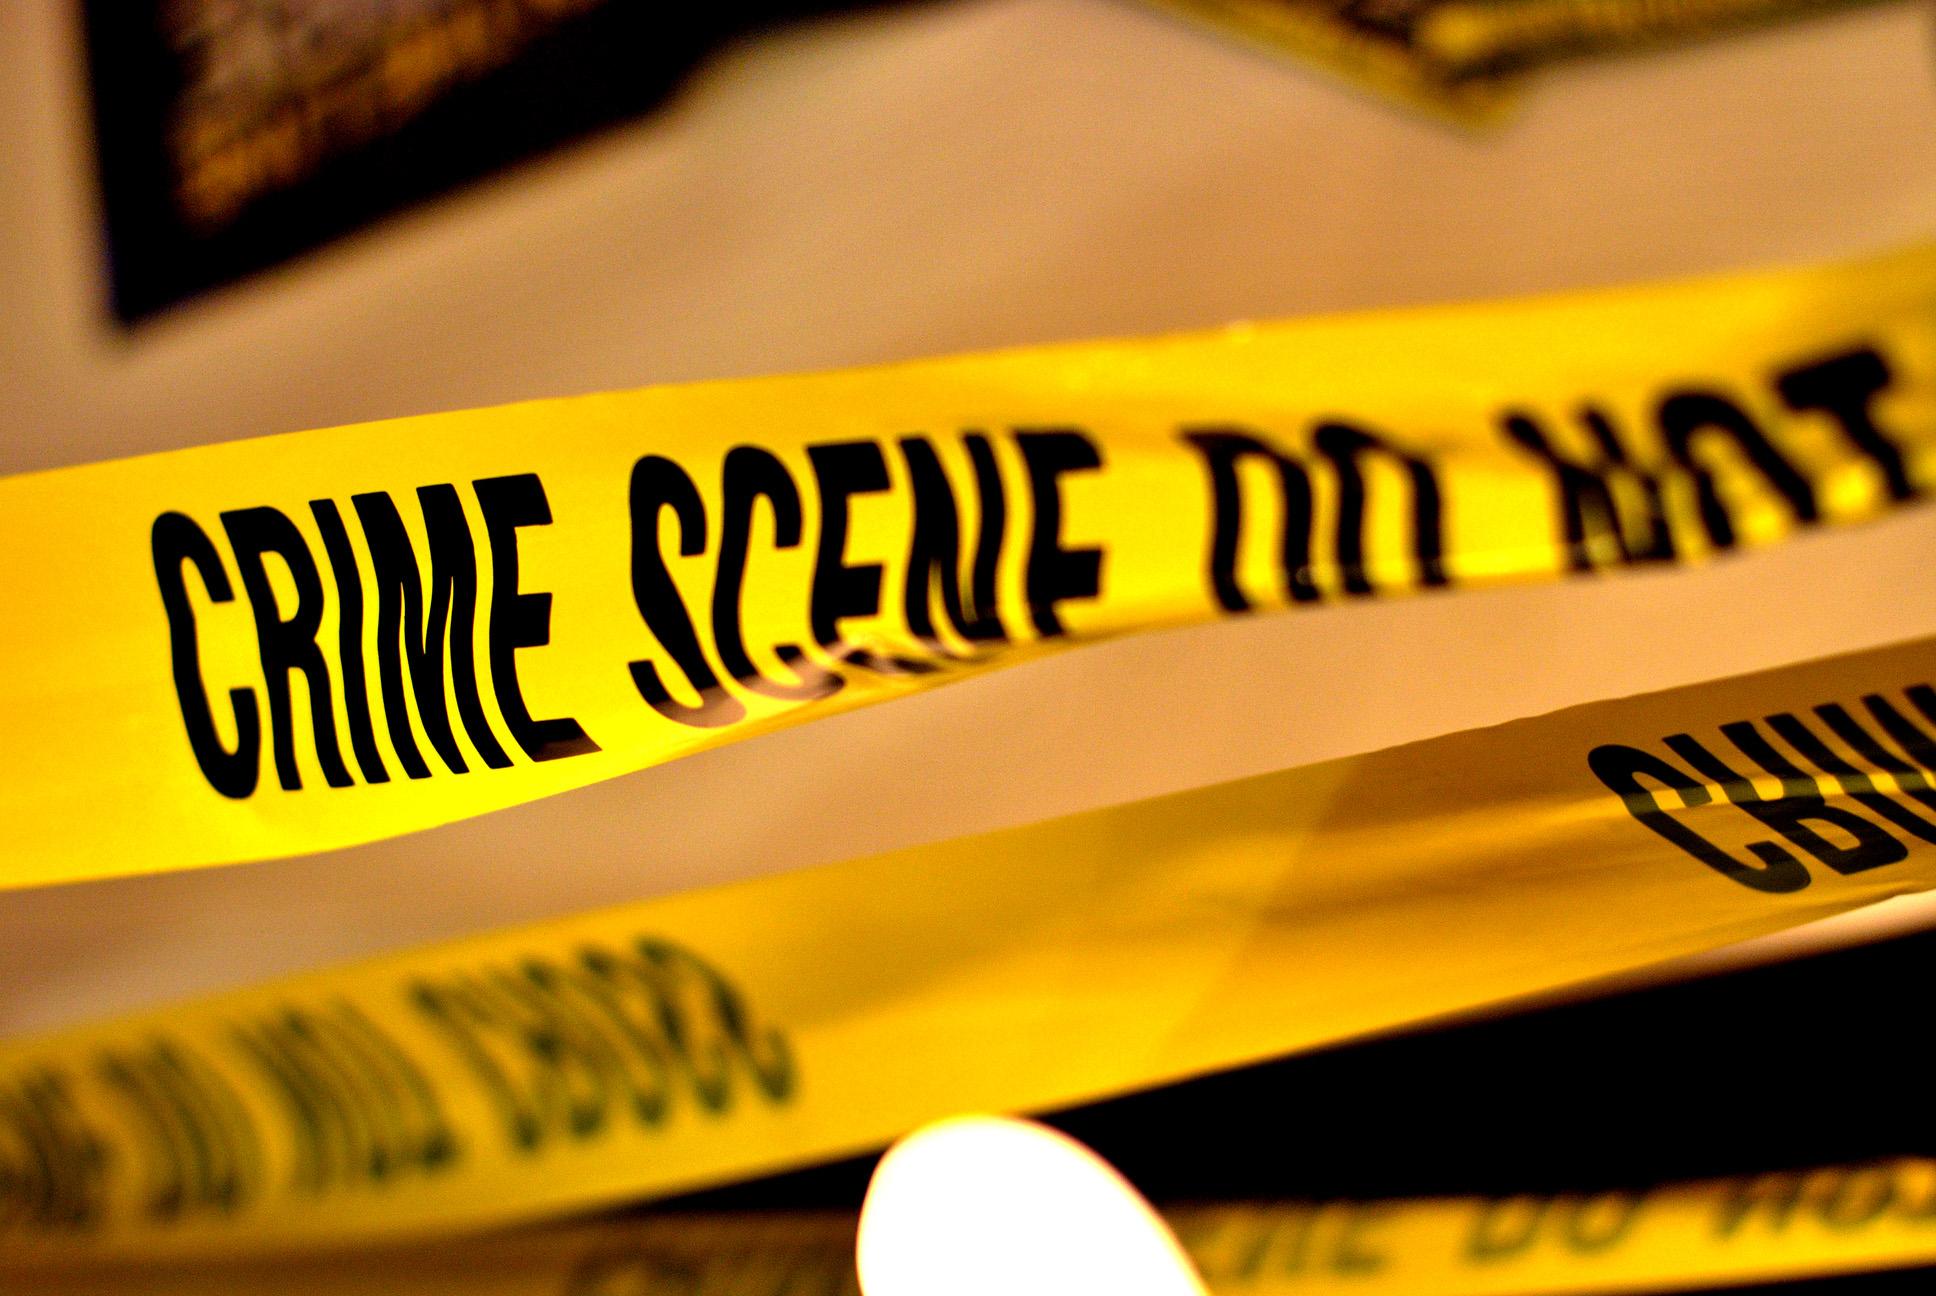 Image of crime scene tape